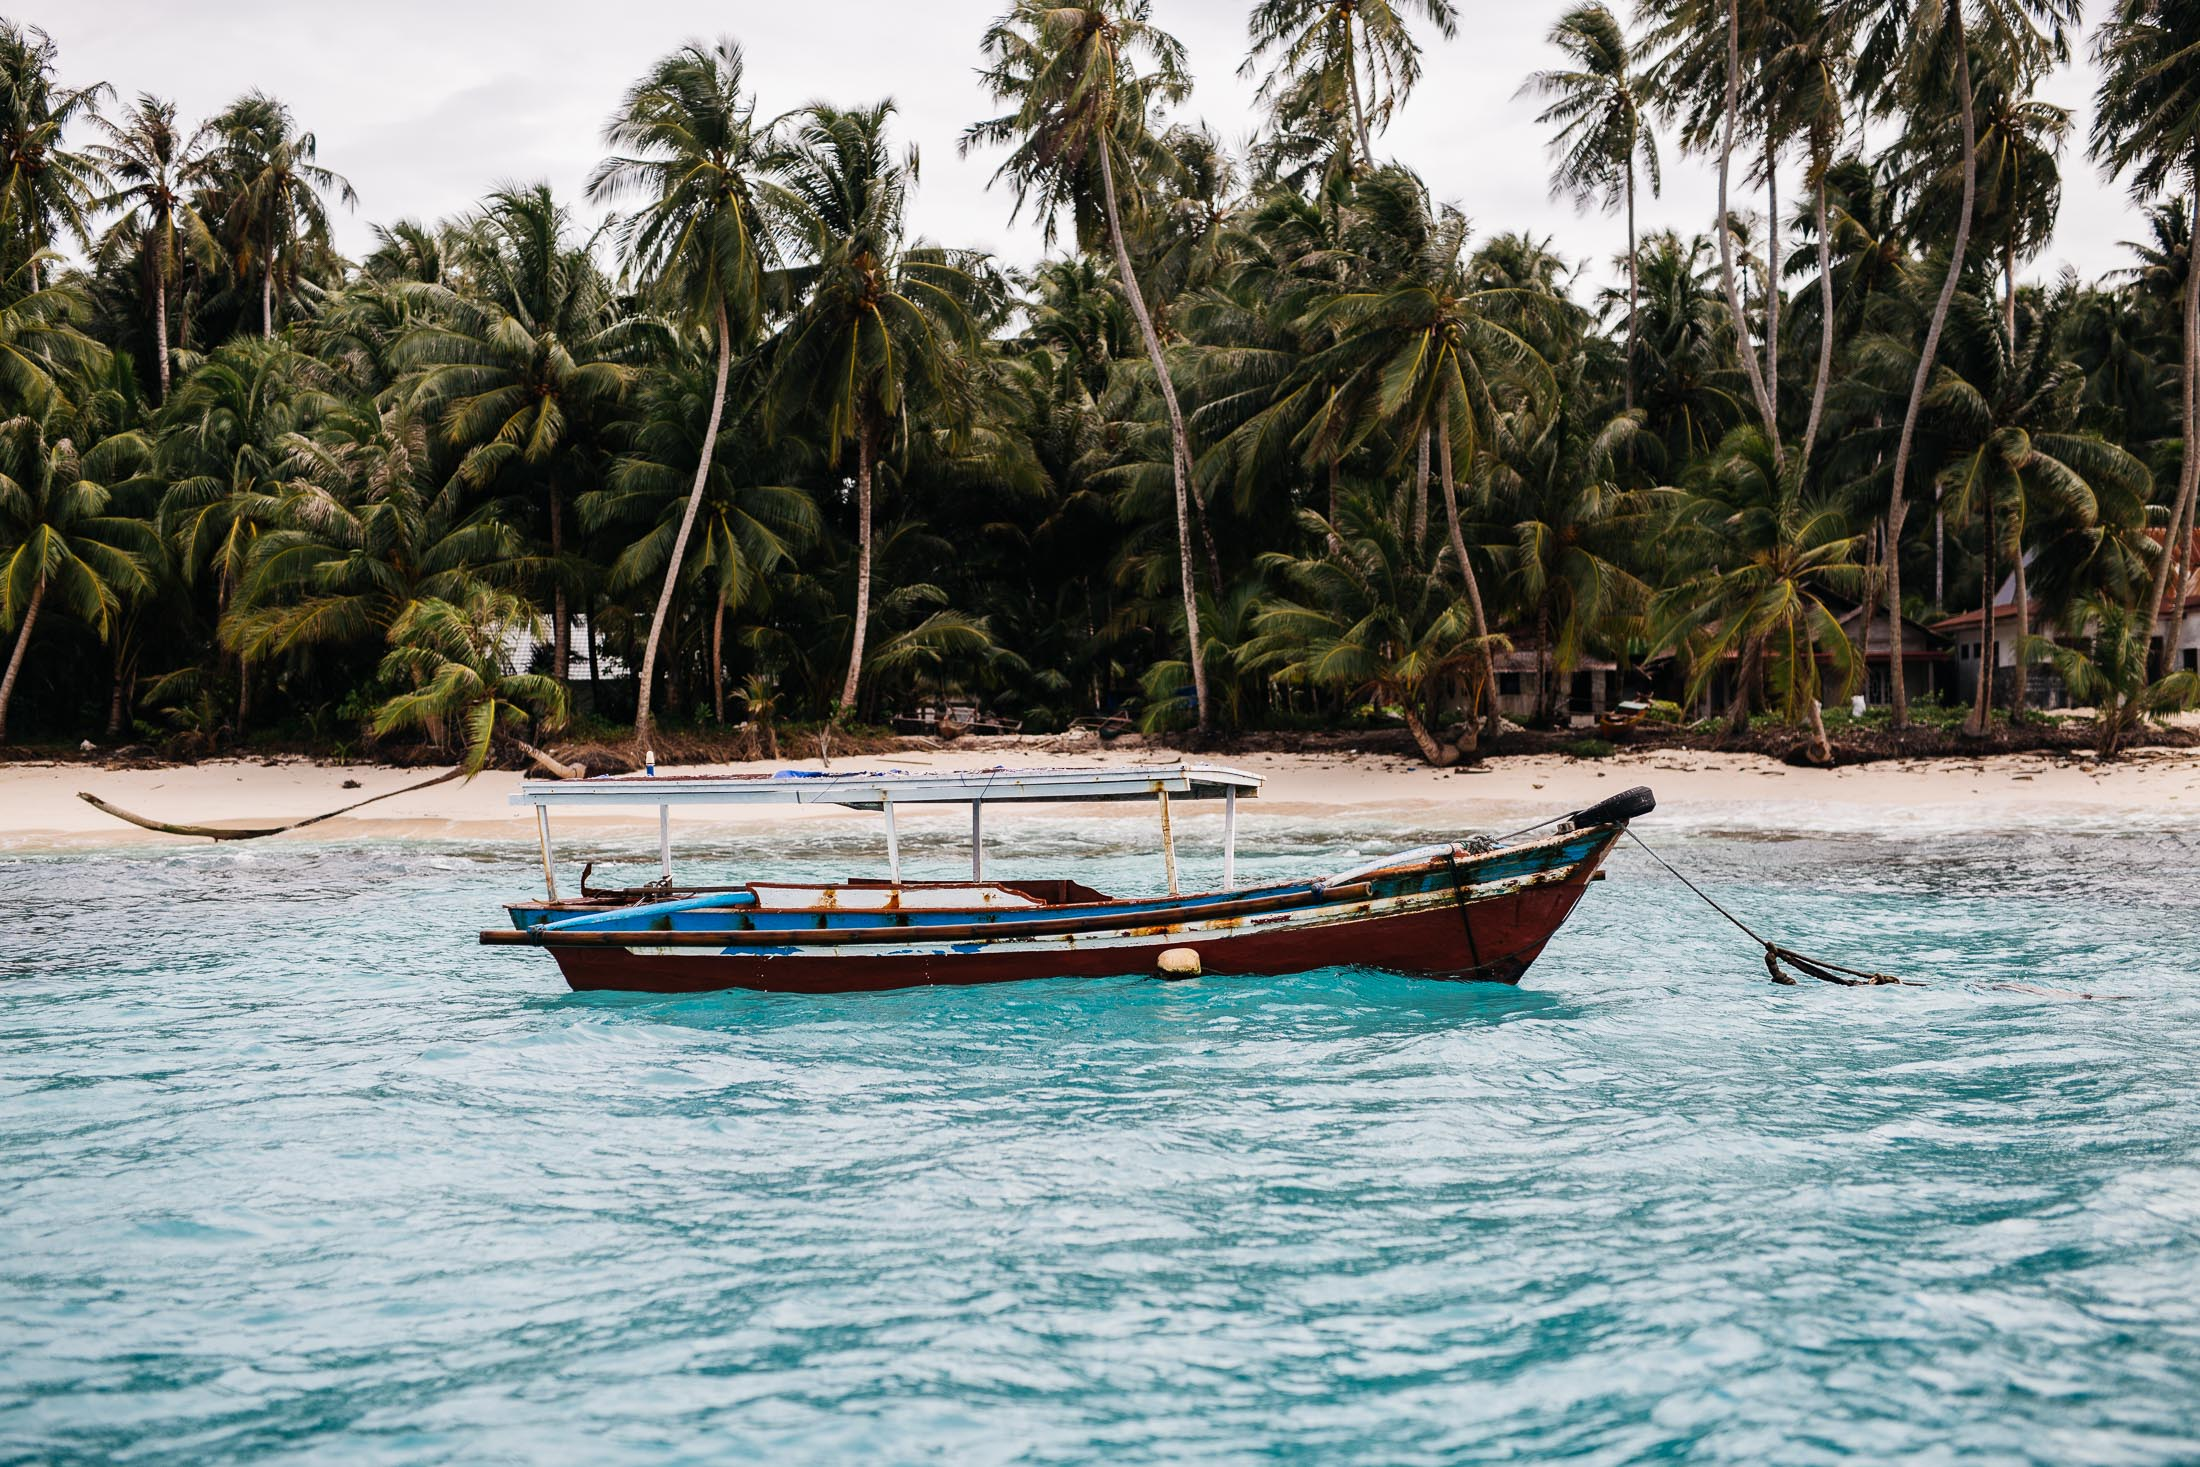 TELO ISLANDS 16